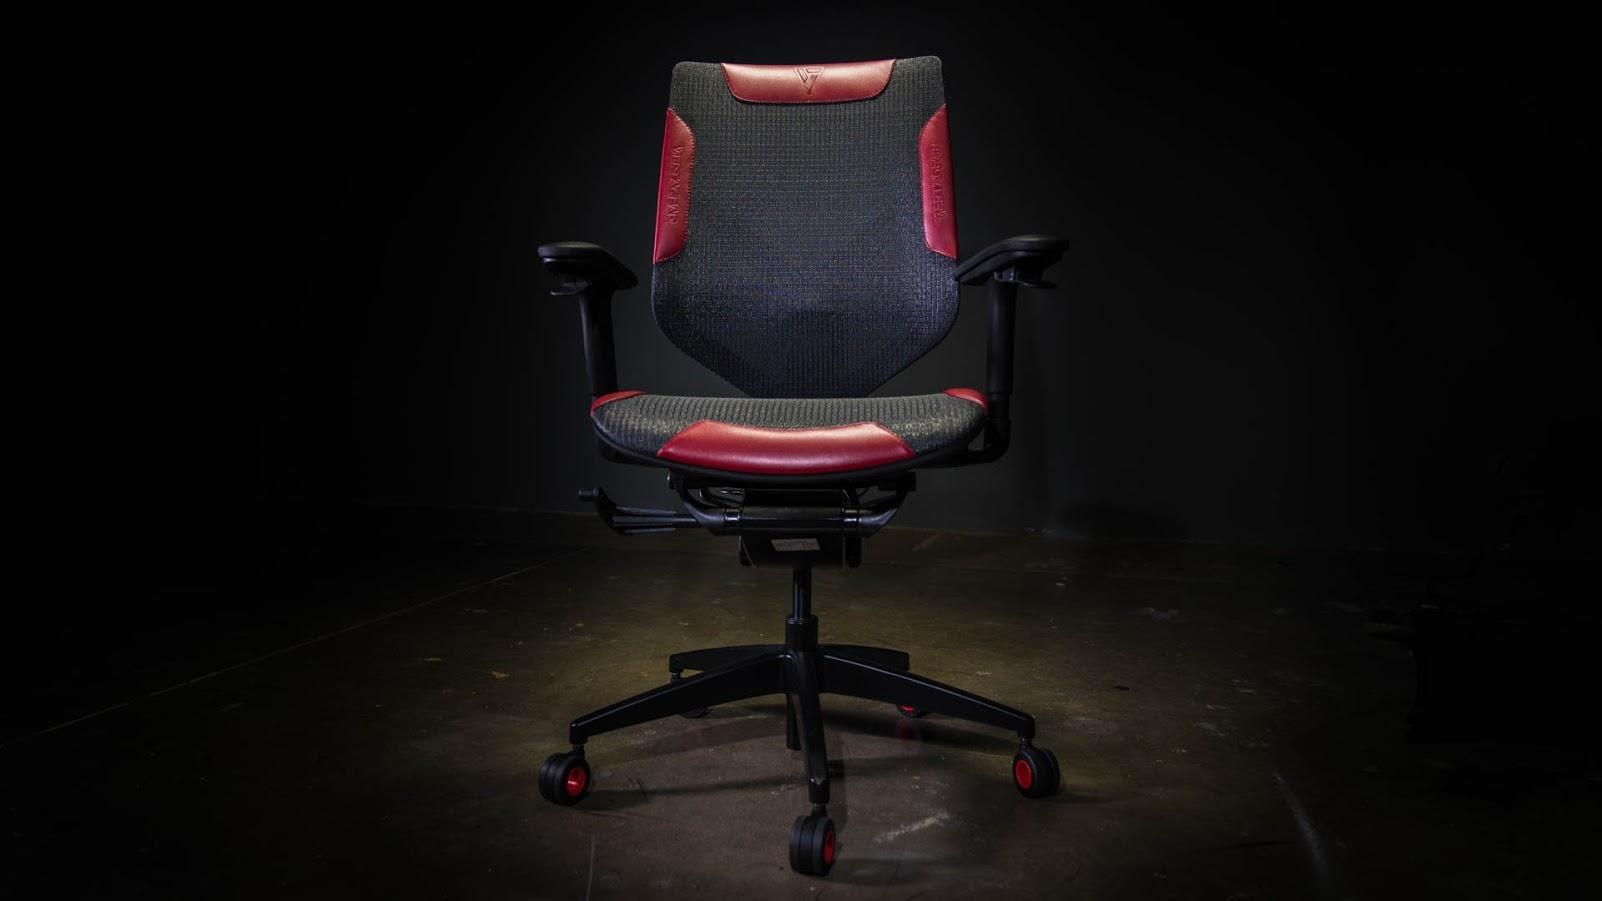 Vertagear triigger gaming chair